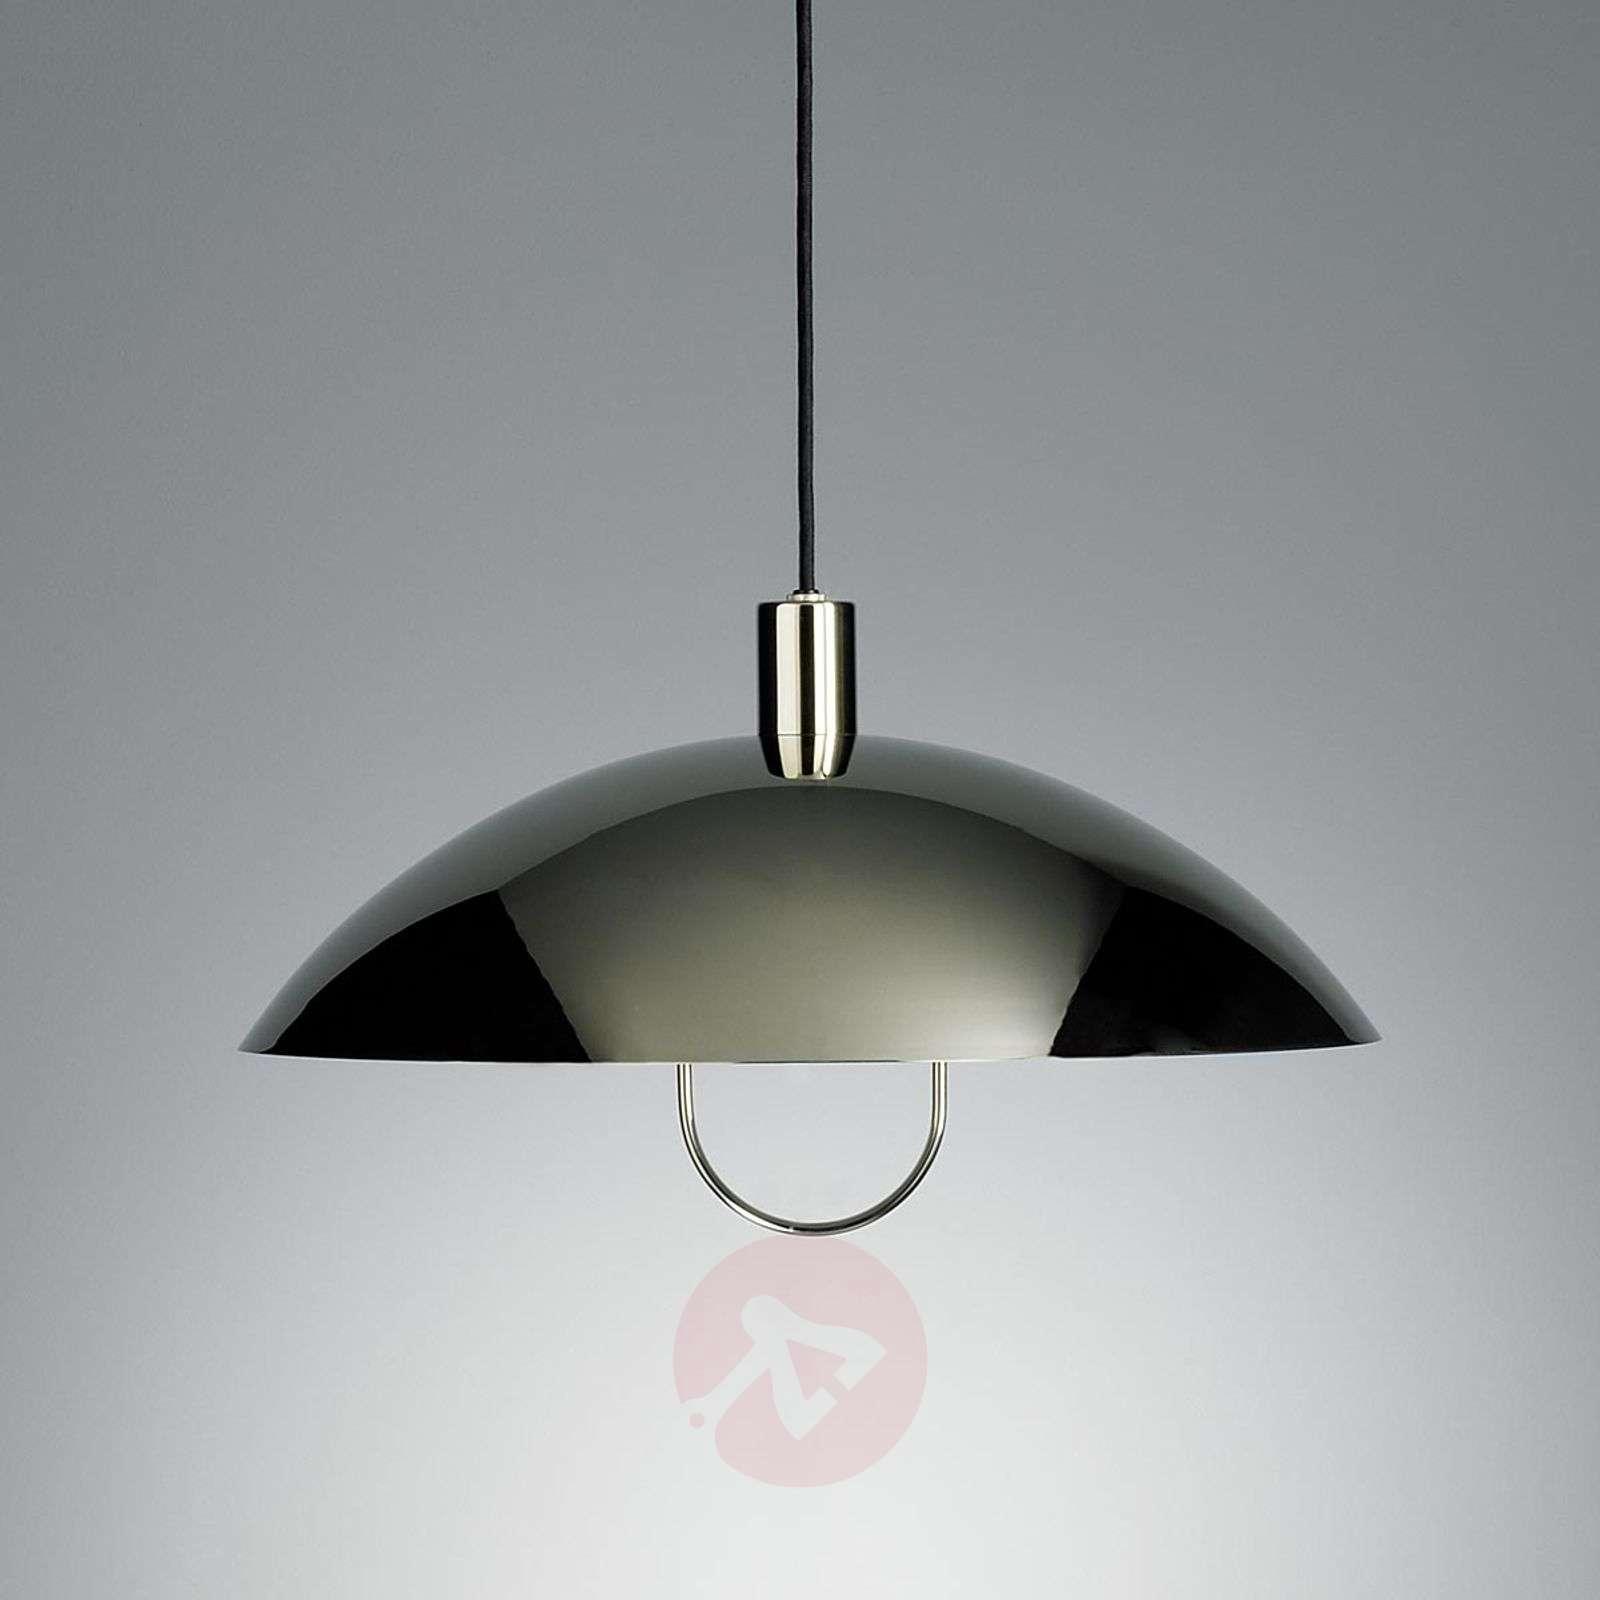 TECNOLUMEN HMB 25/500 hanging light with pulley-9030121X-01